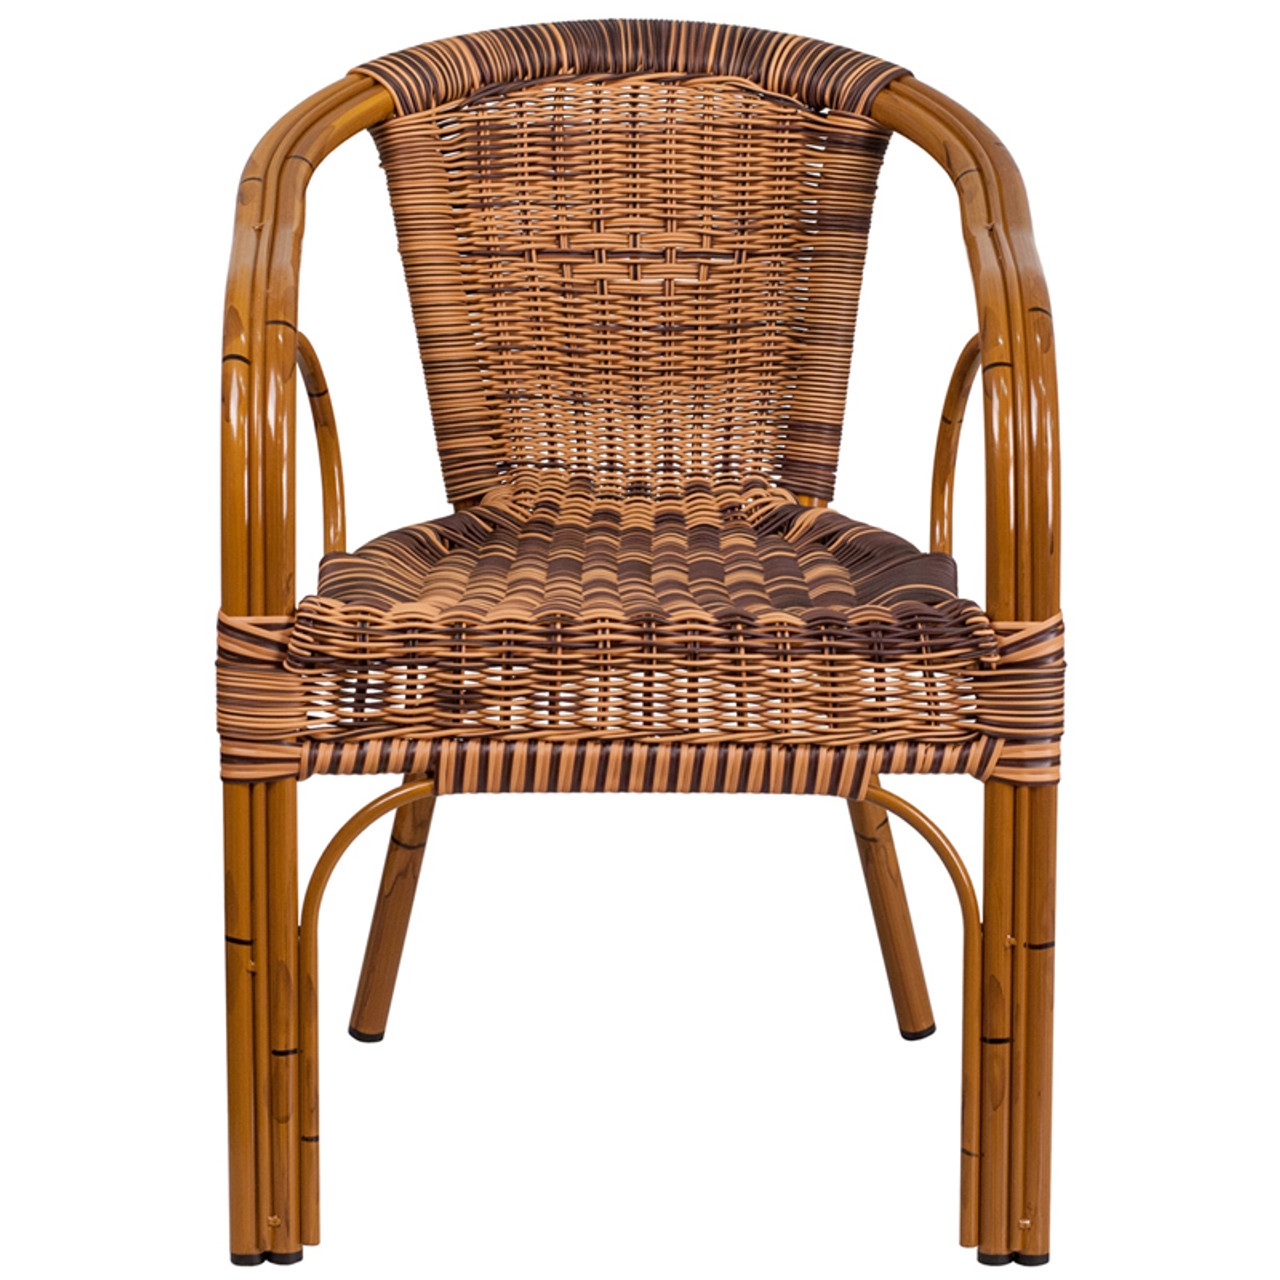 Bamboo Patio Chairs